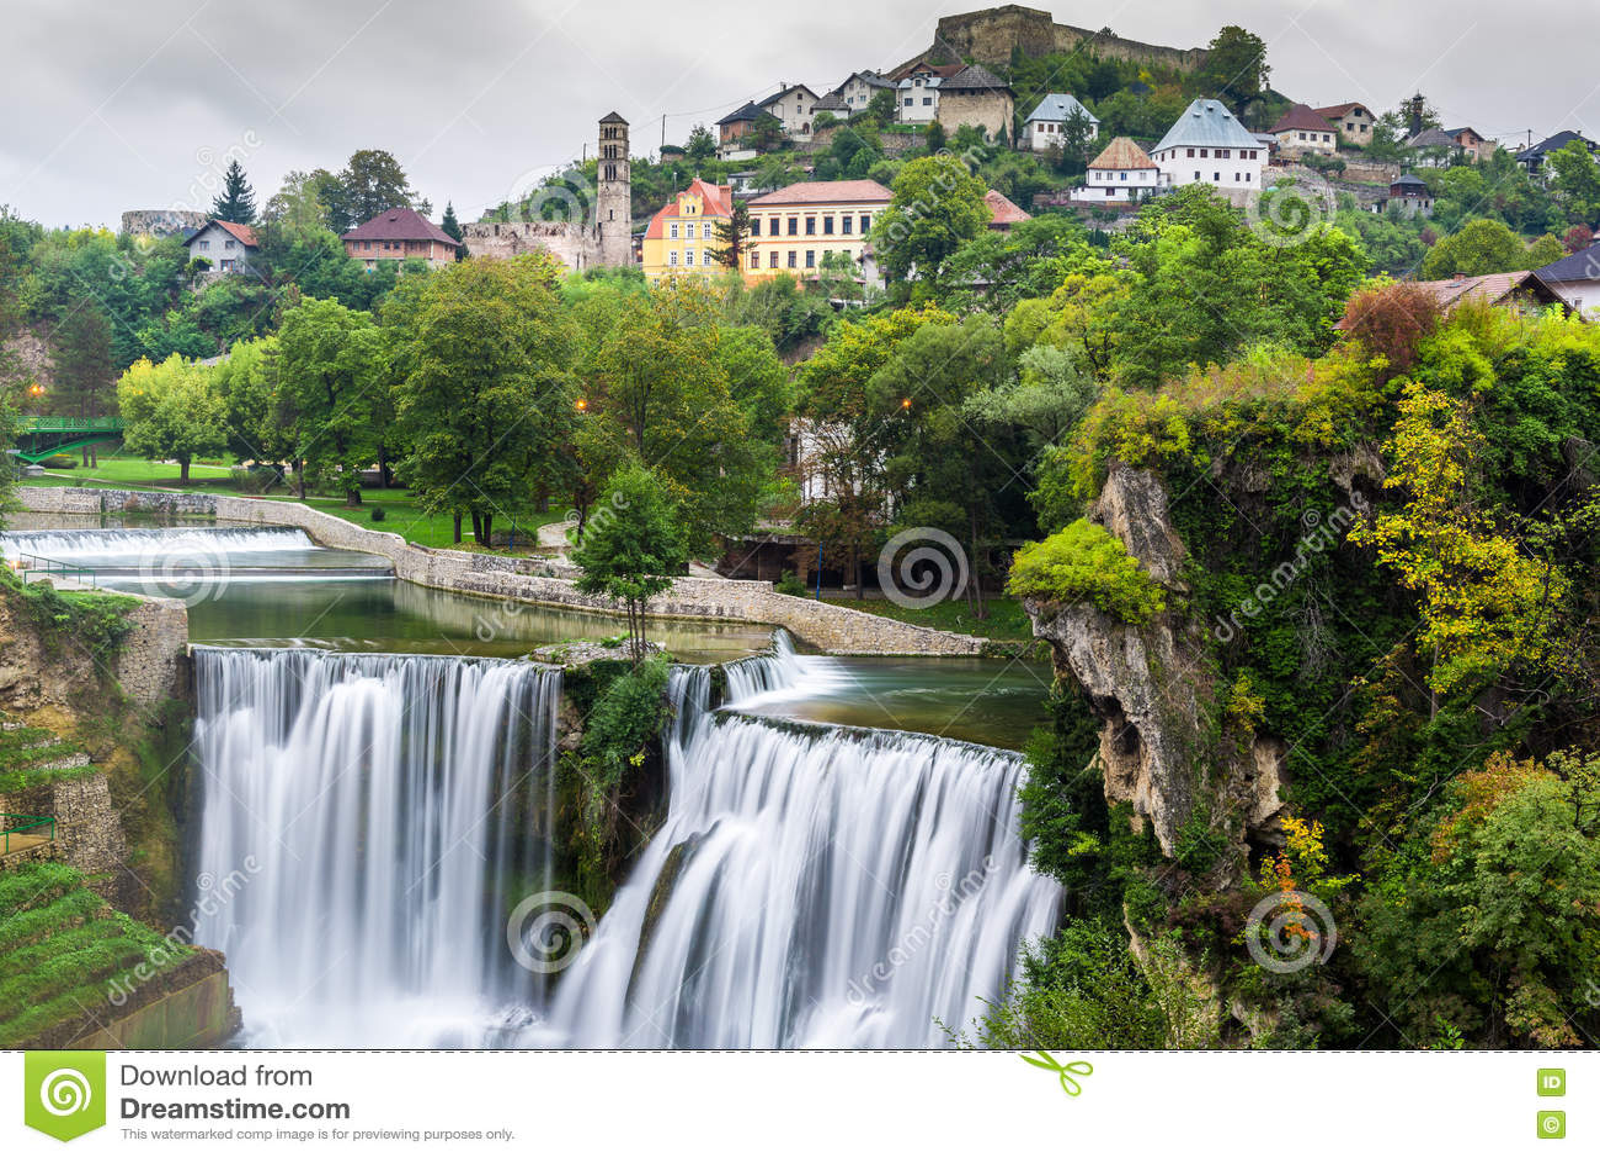 Town of Jajce and Pliva Waterfall (Bosnia and Herzegovina)